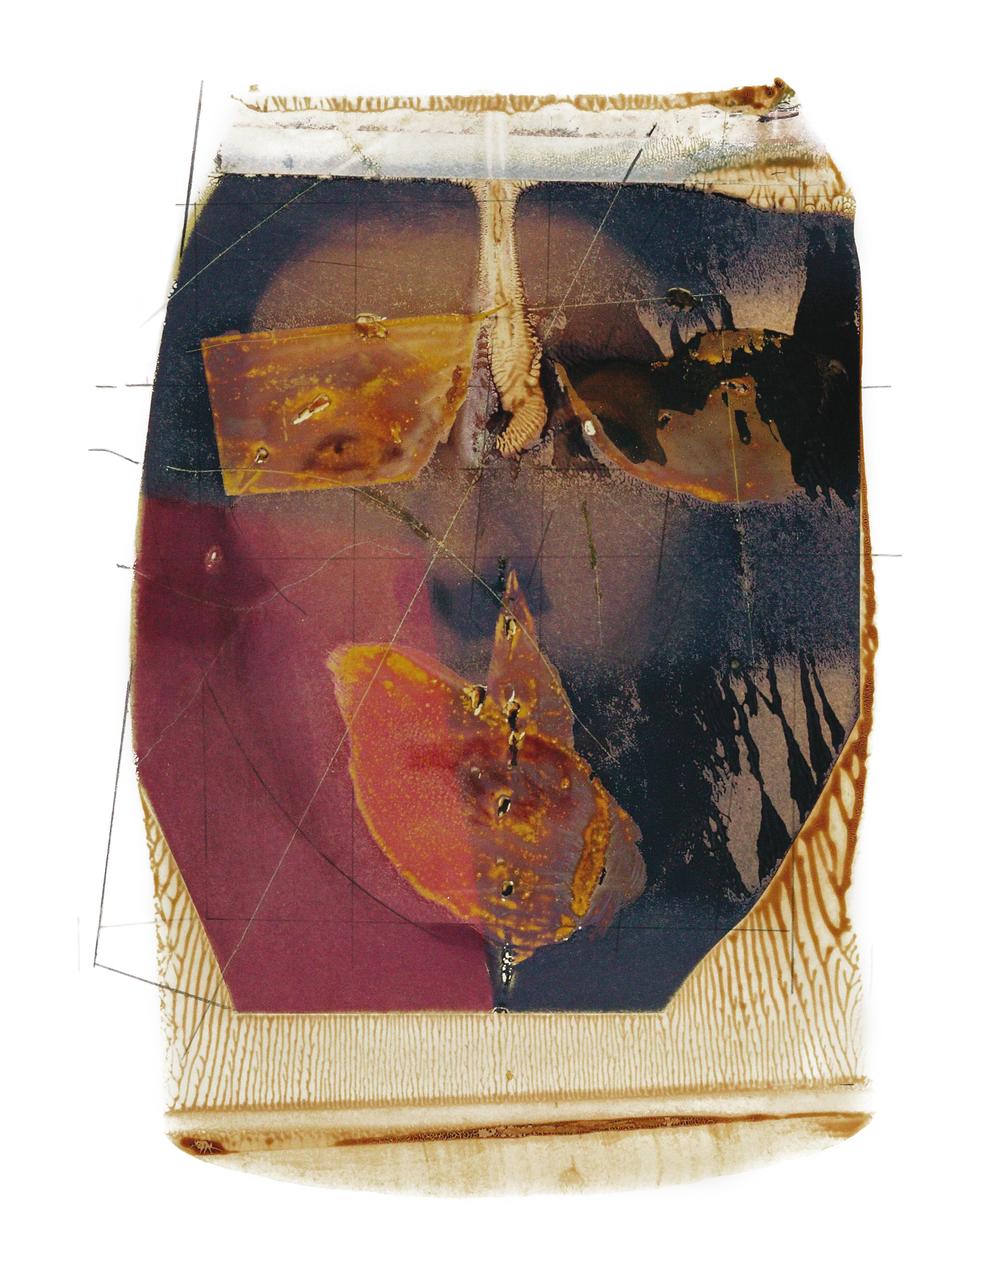 GIOLI_POLAROID 2004-83.png